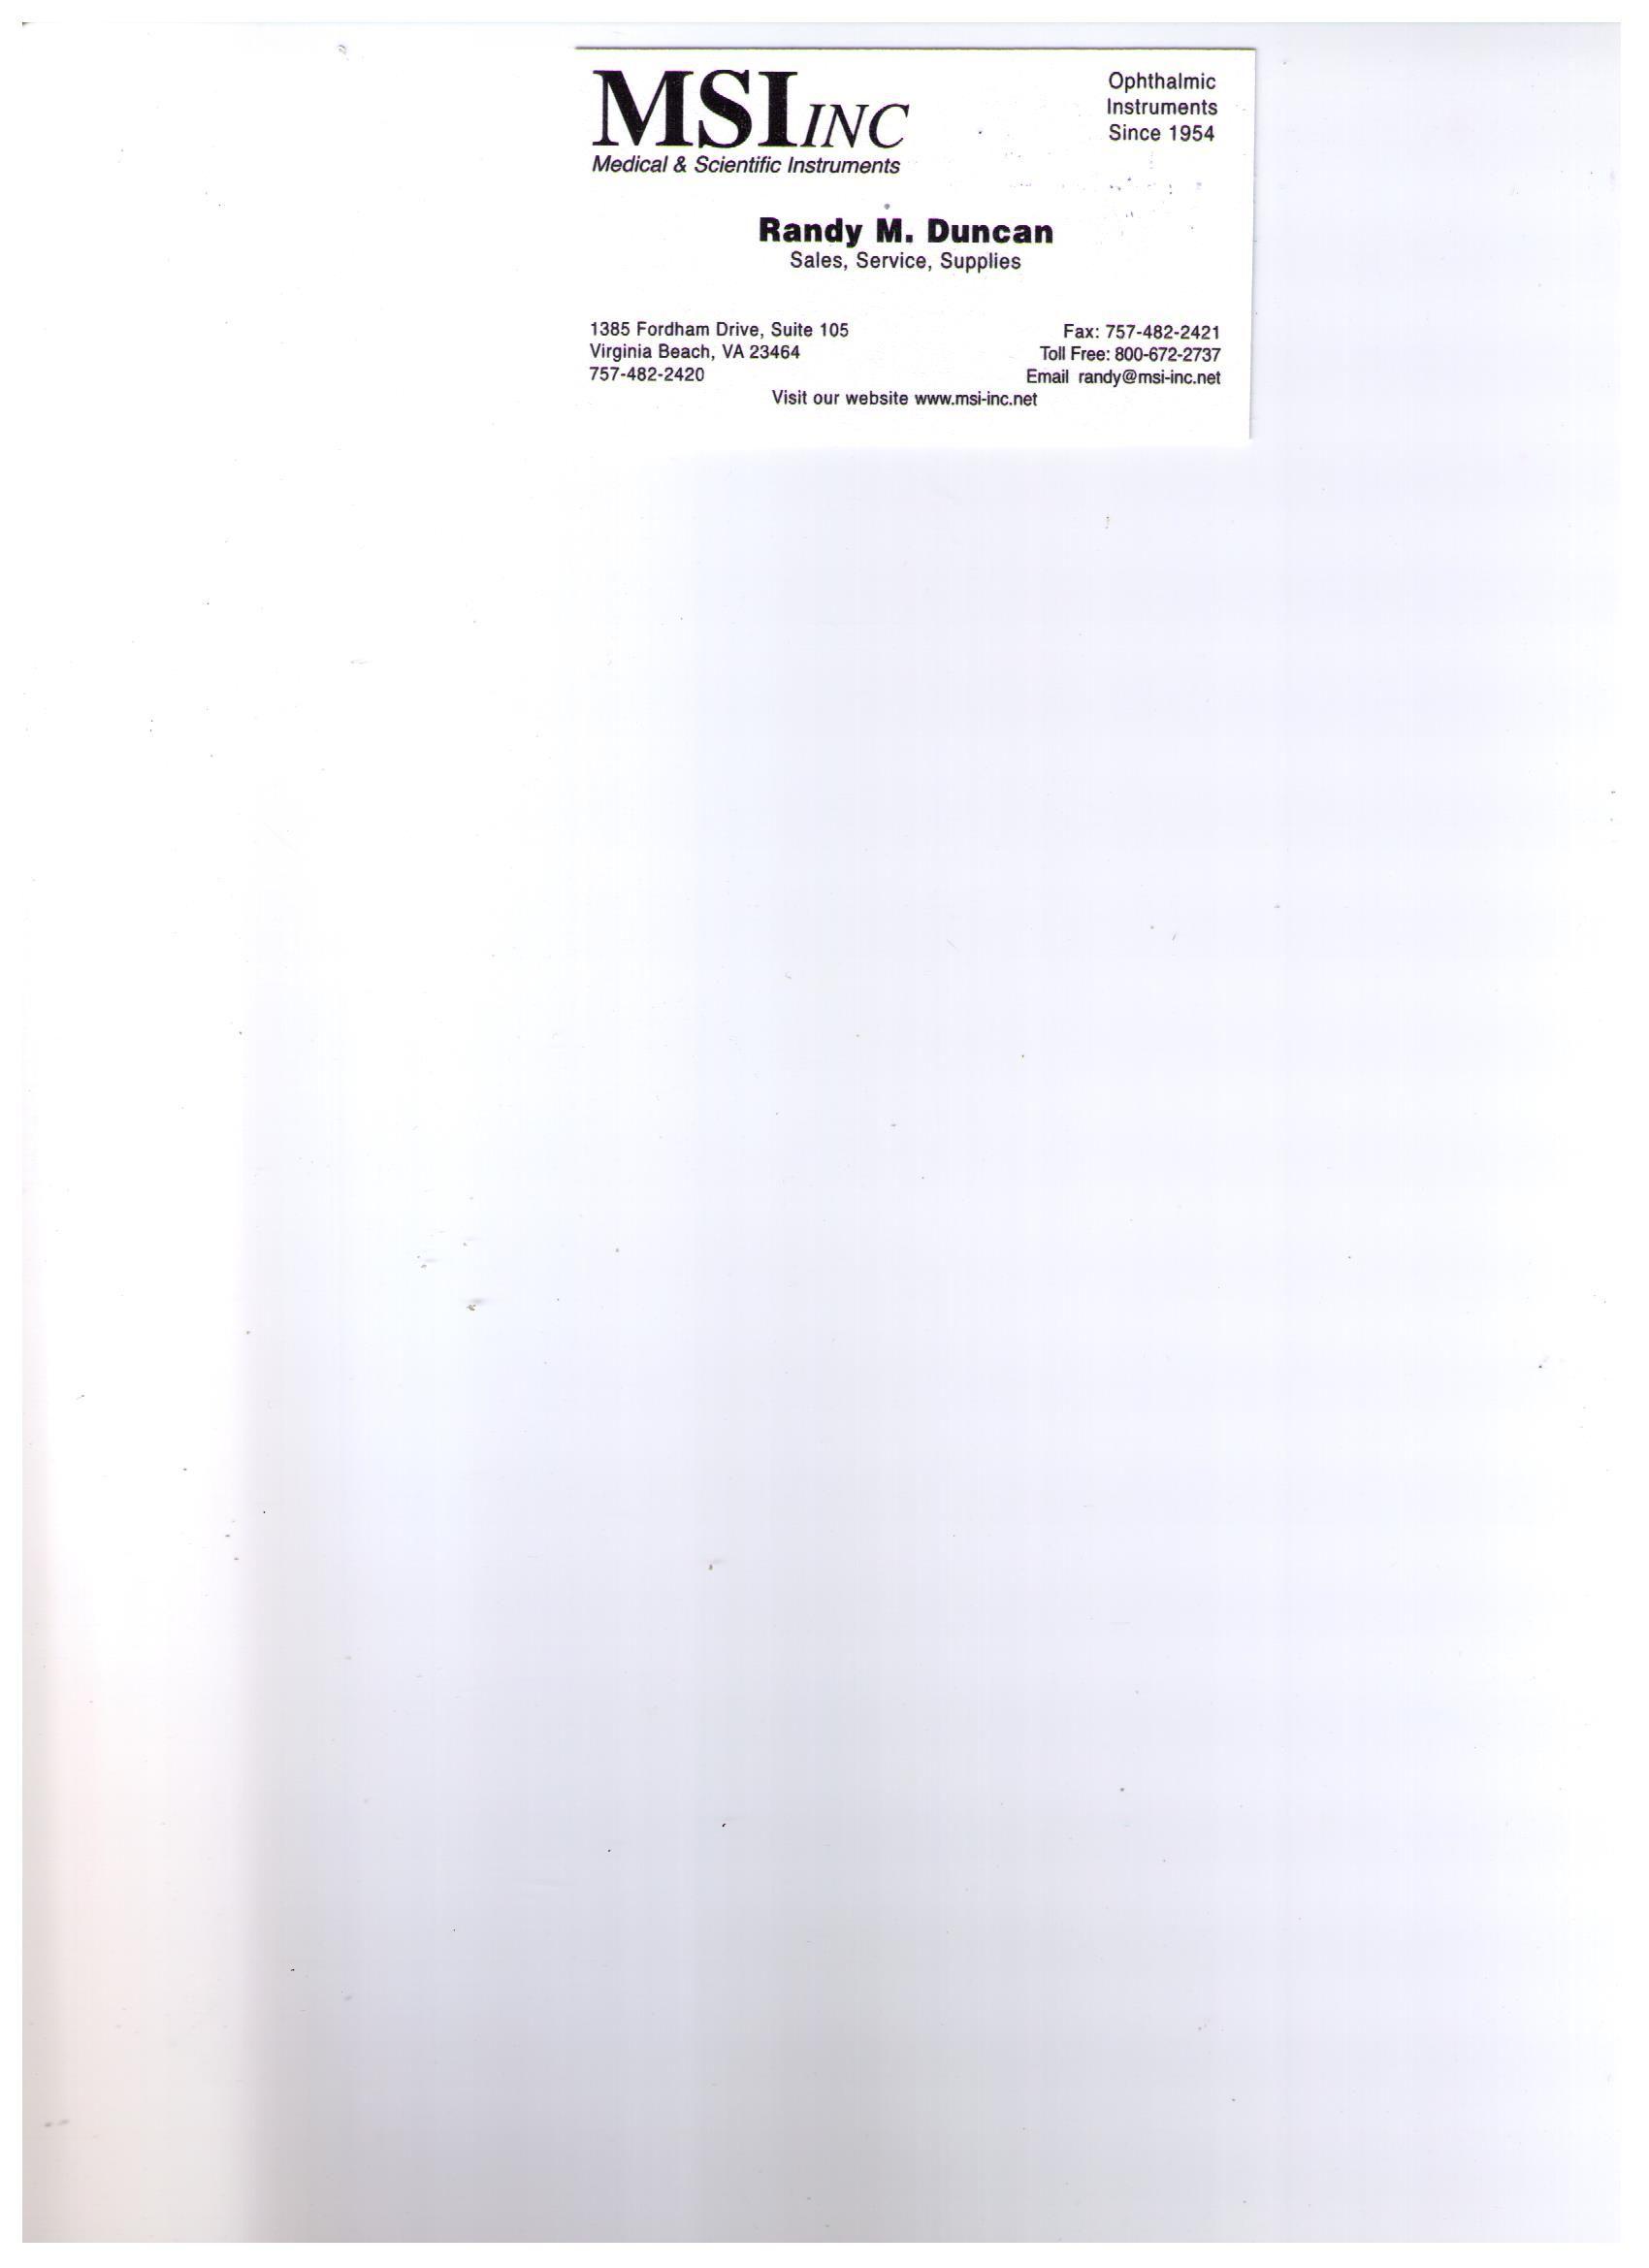 Medical & Scientific Instruments image 4